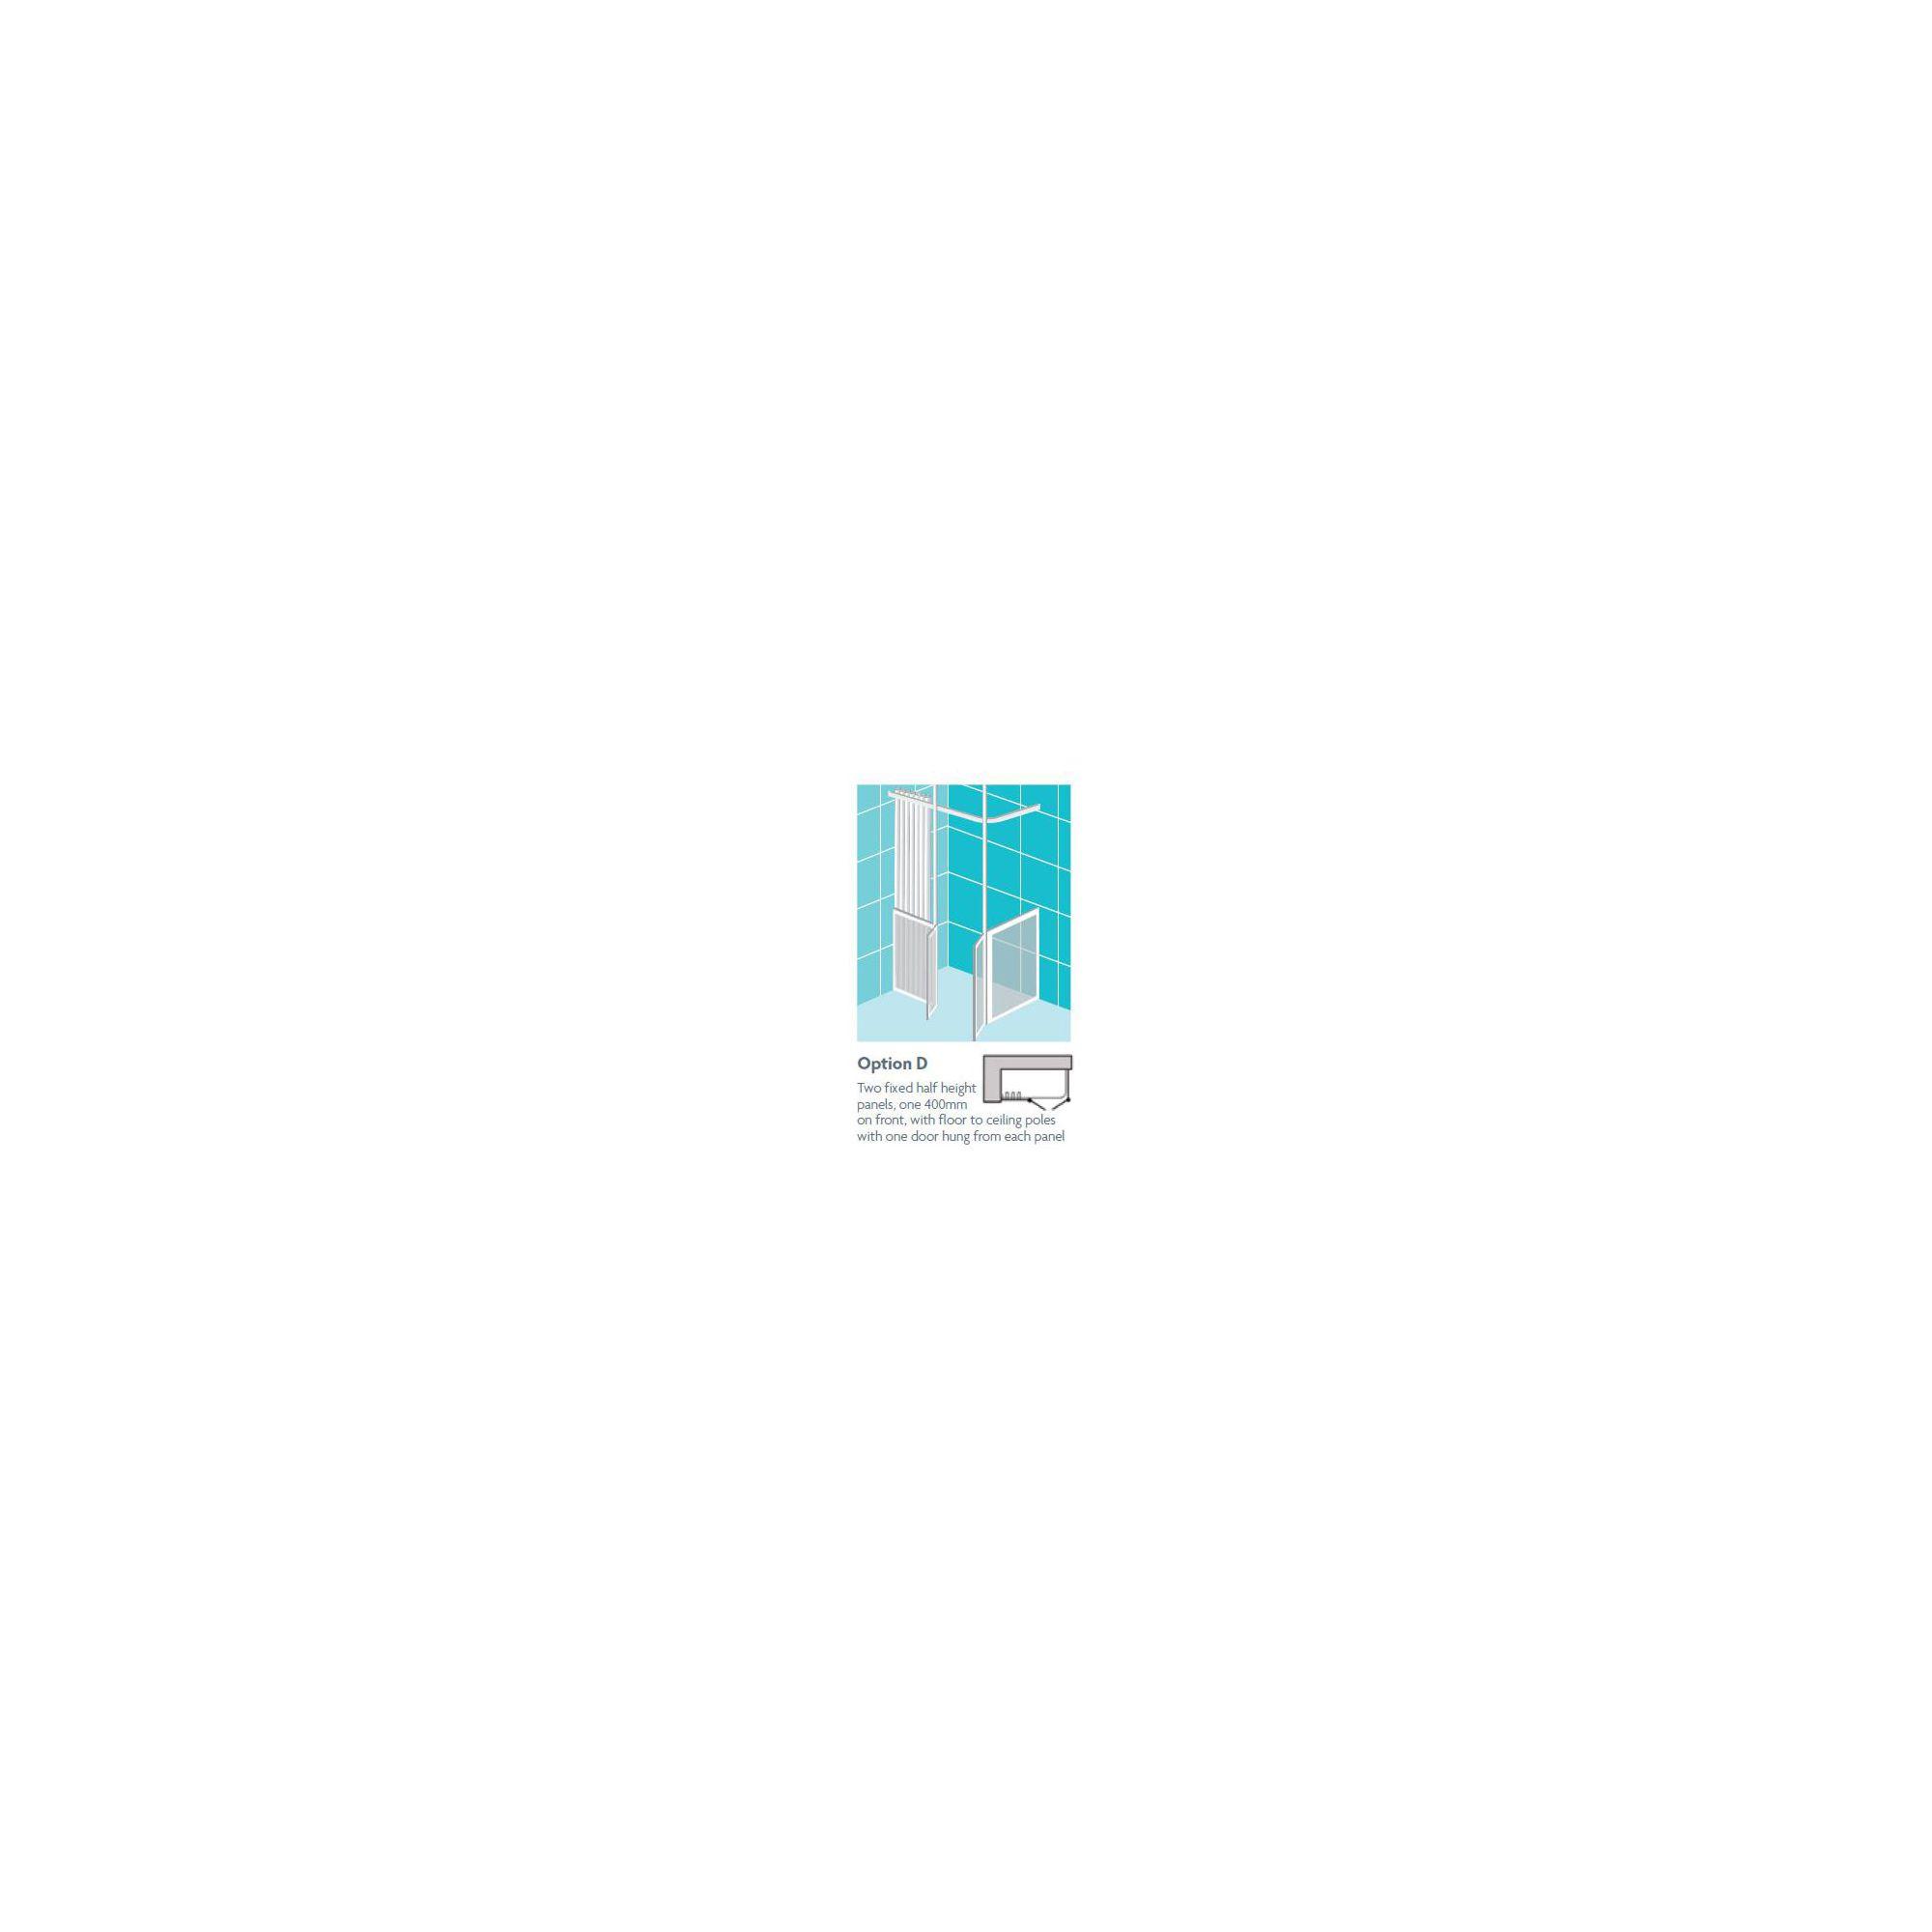 Impey Supreme Corner Door Option D Left Hand 1500mm x 1200mm at Tesco Direct